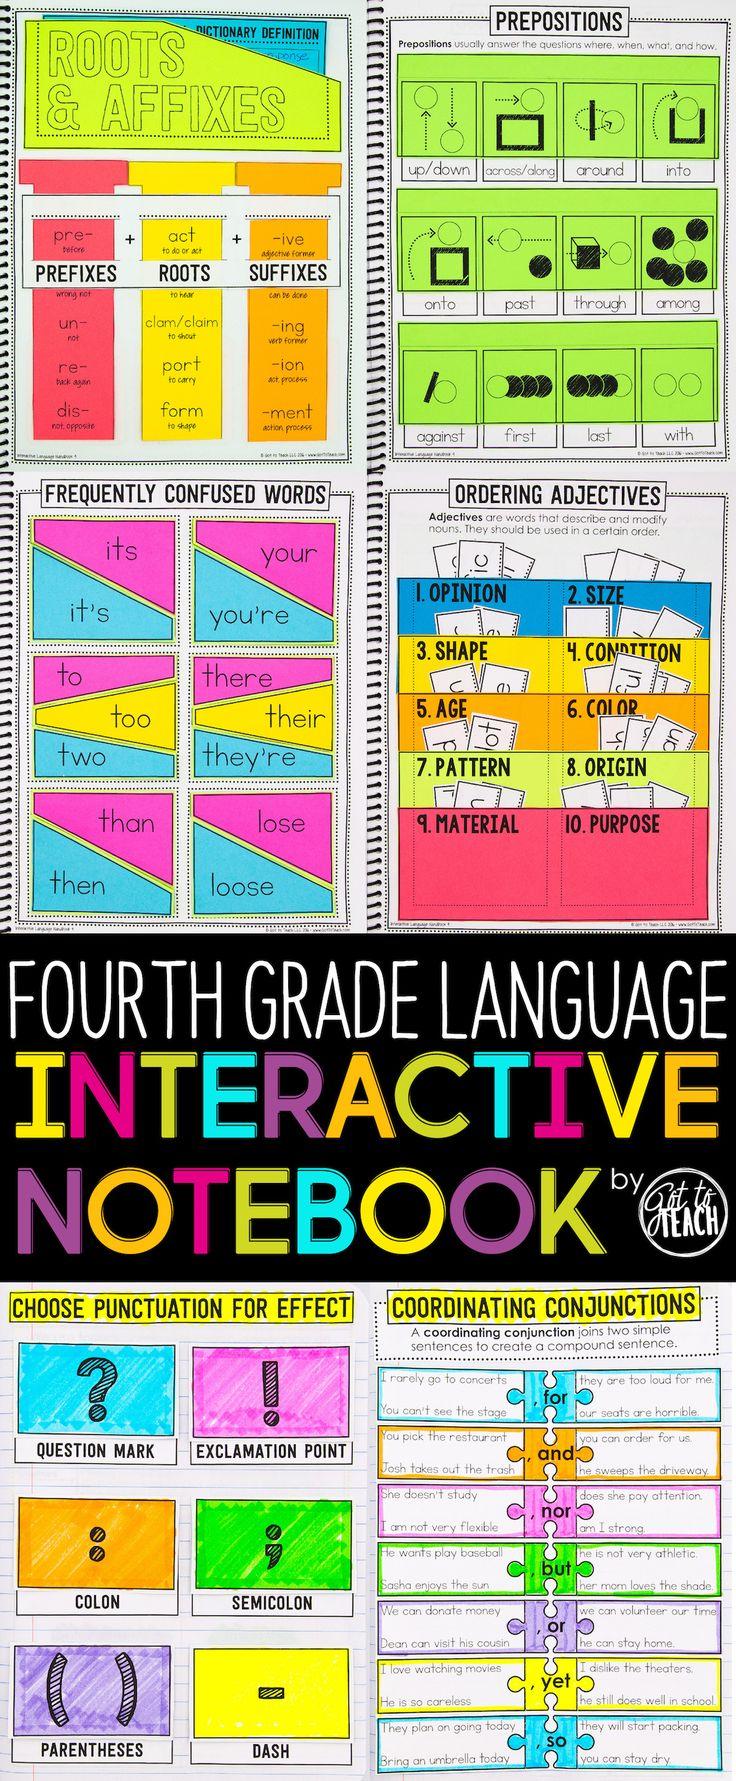 4th Grade Language Interactive Pocket book Grammar Interactive Pocket book